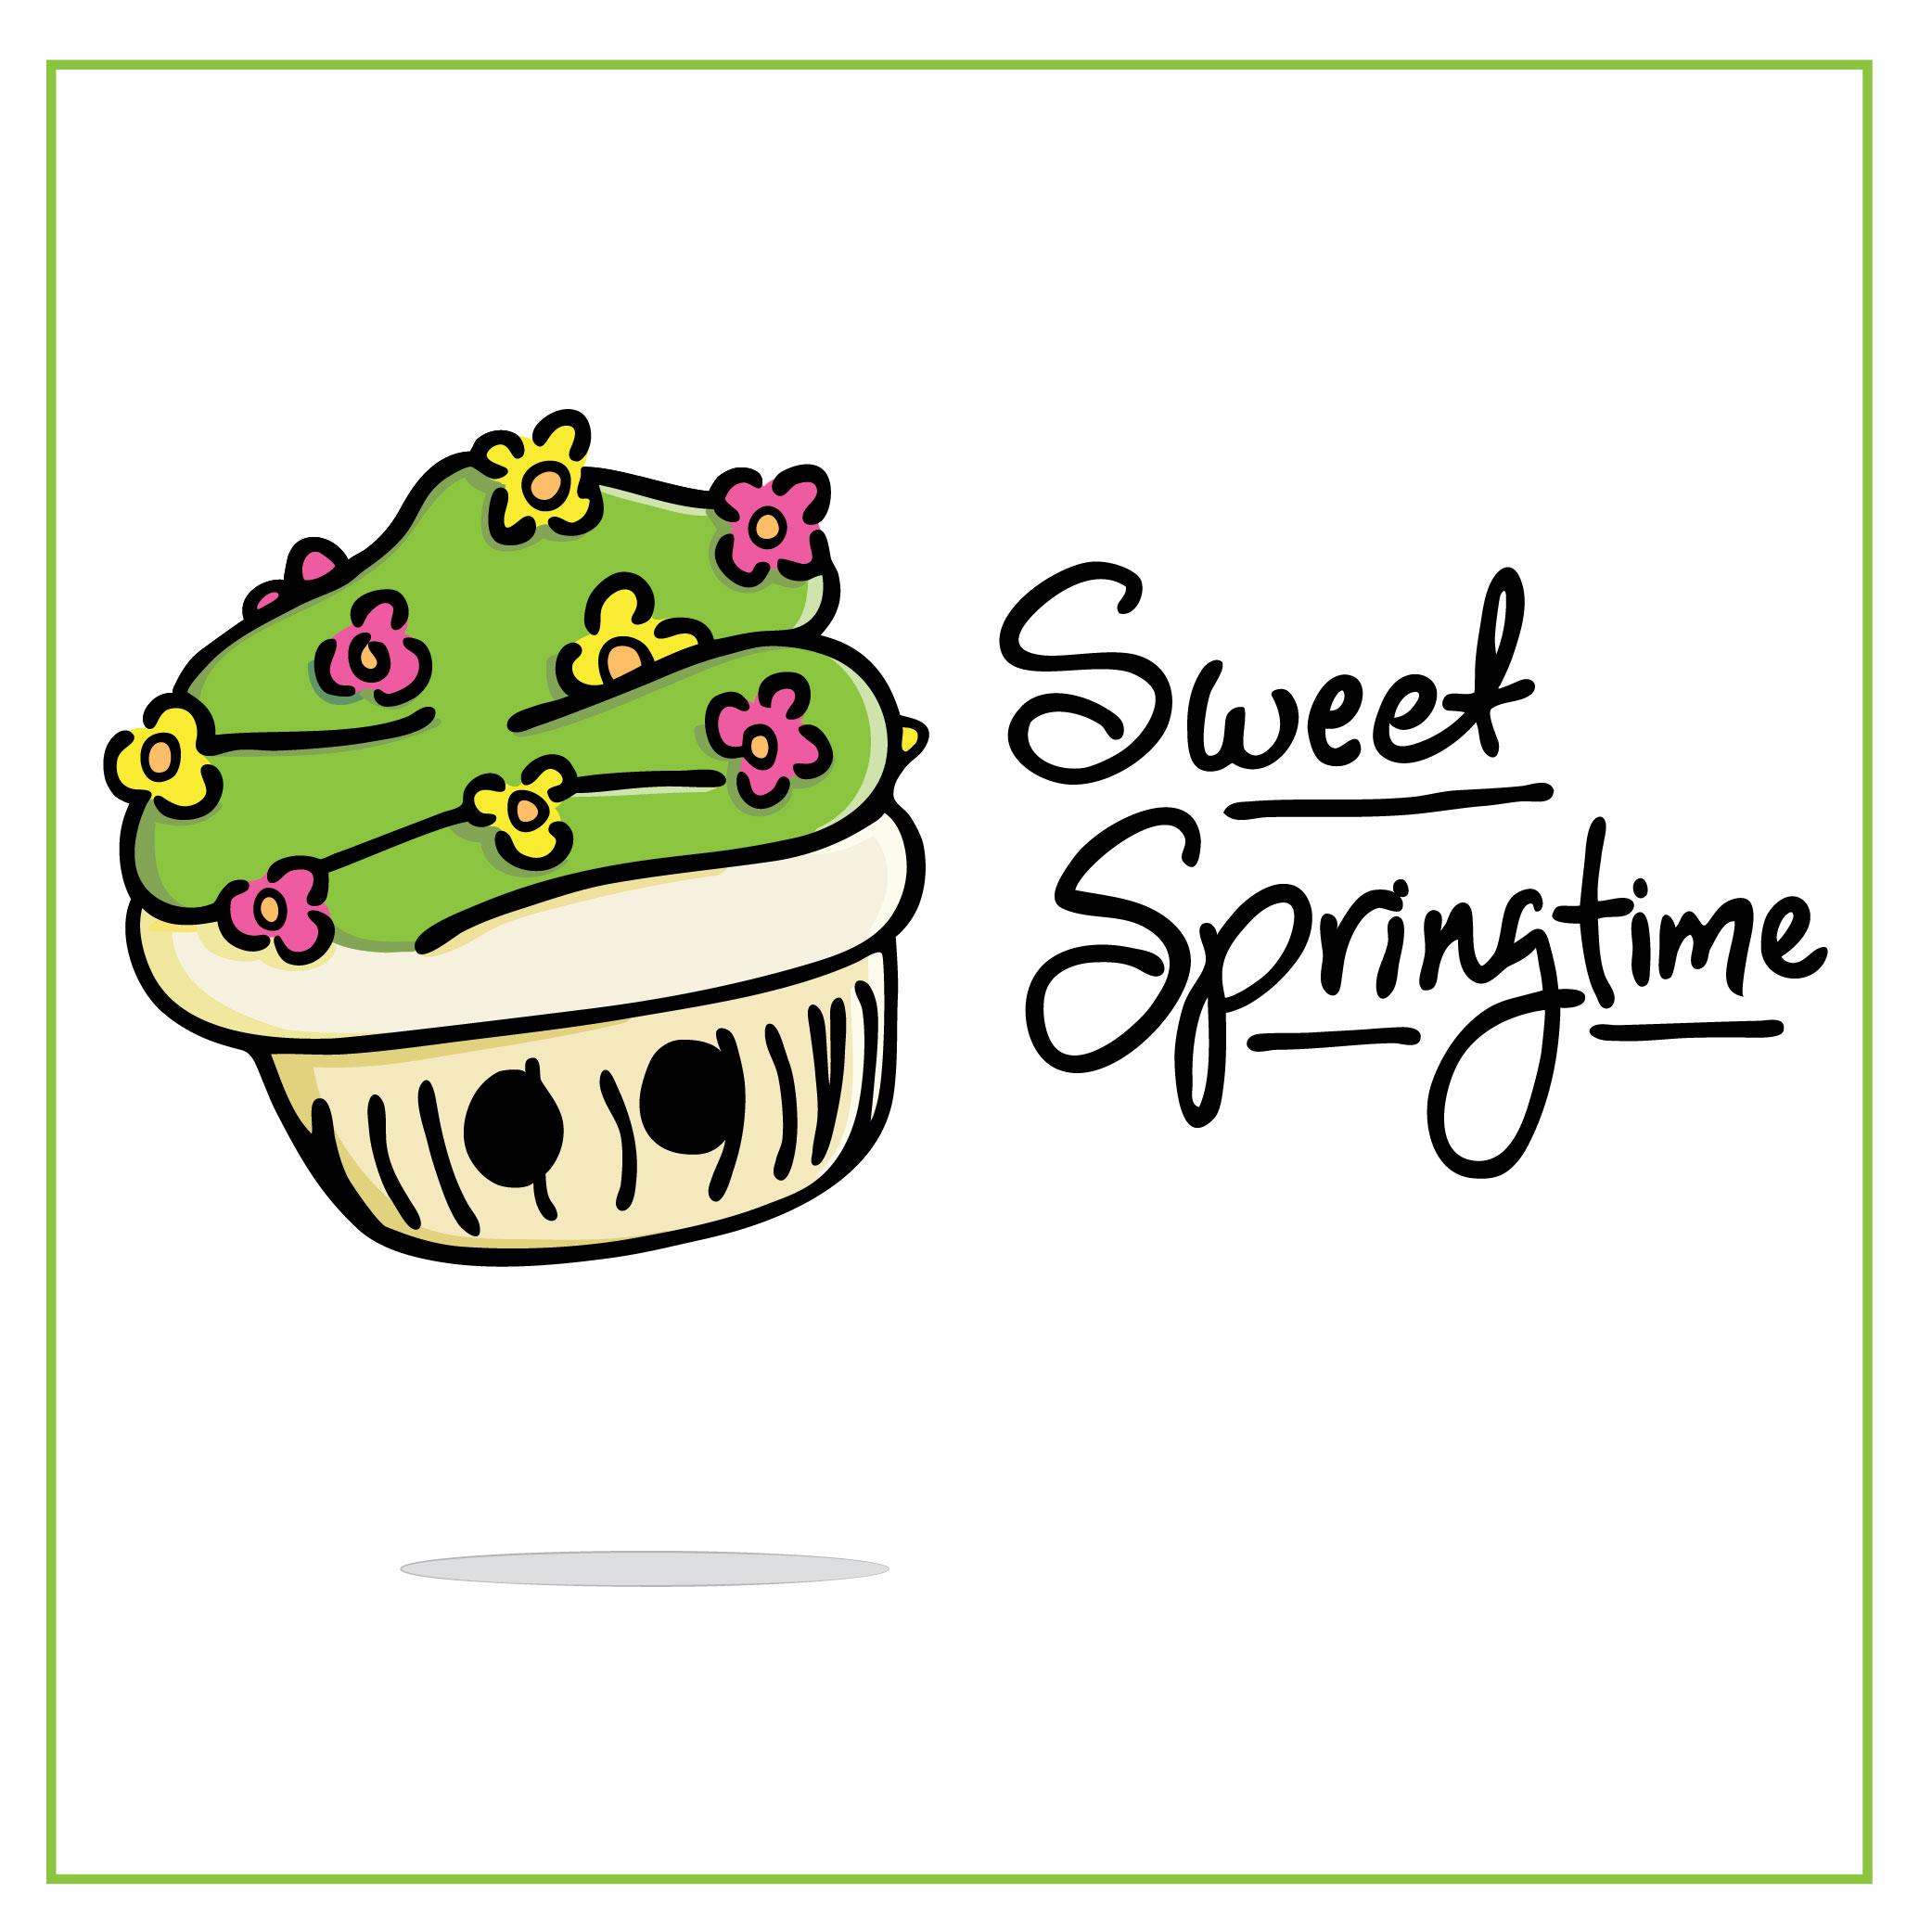 Sweet-Springtime-Cupcake-Squared-01.jpg